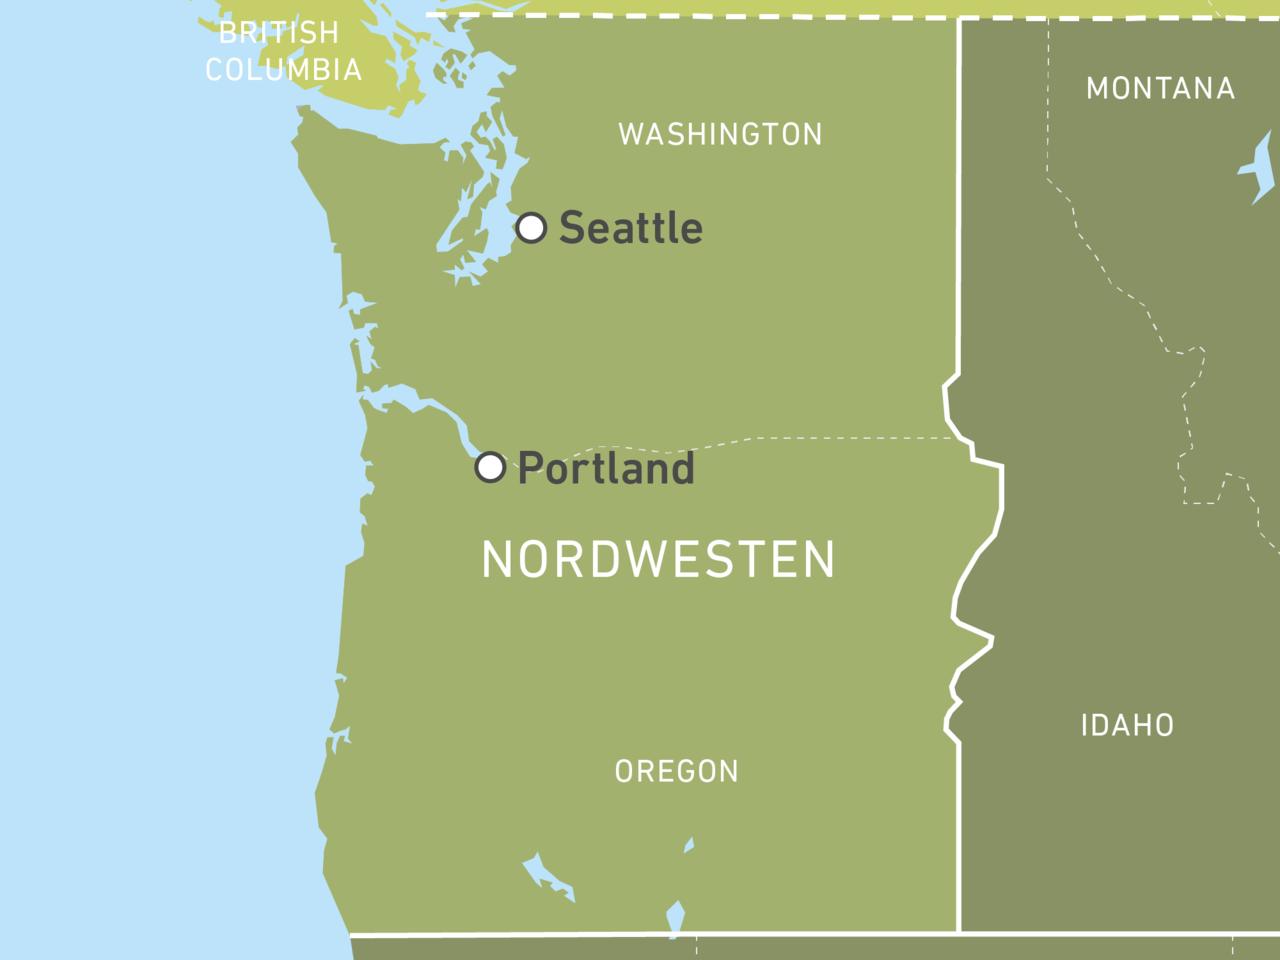 Individuelle Oregon & Washington Reisen buchen! | CANUSA